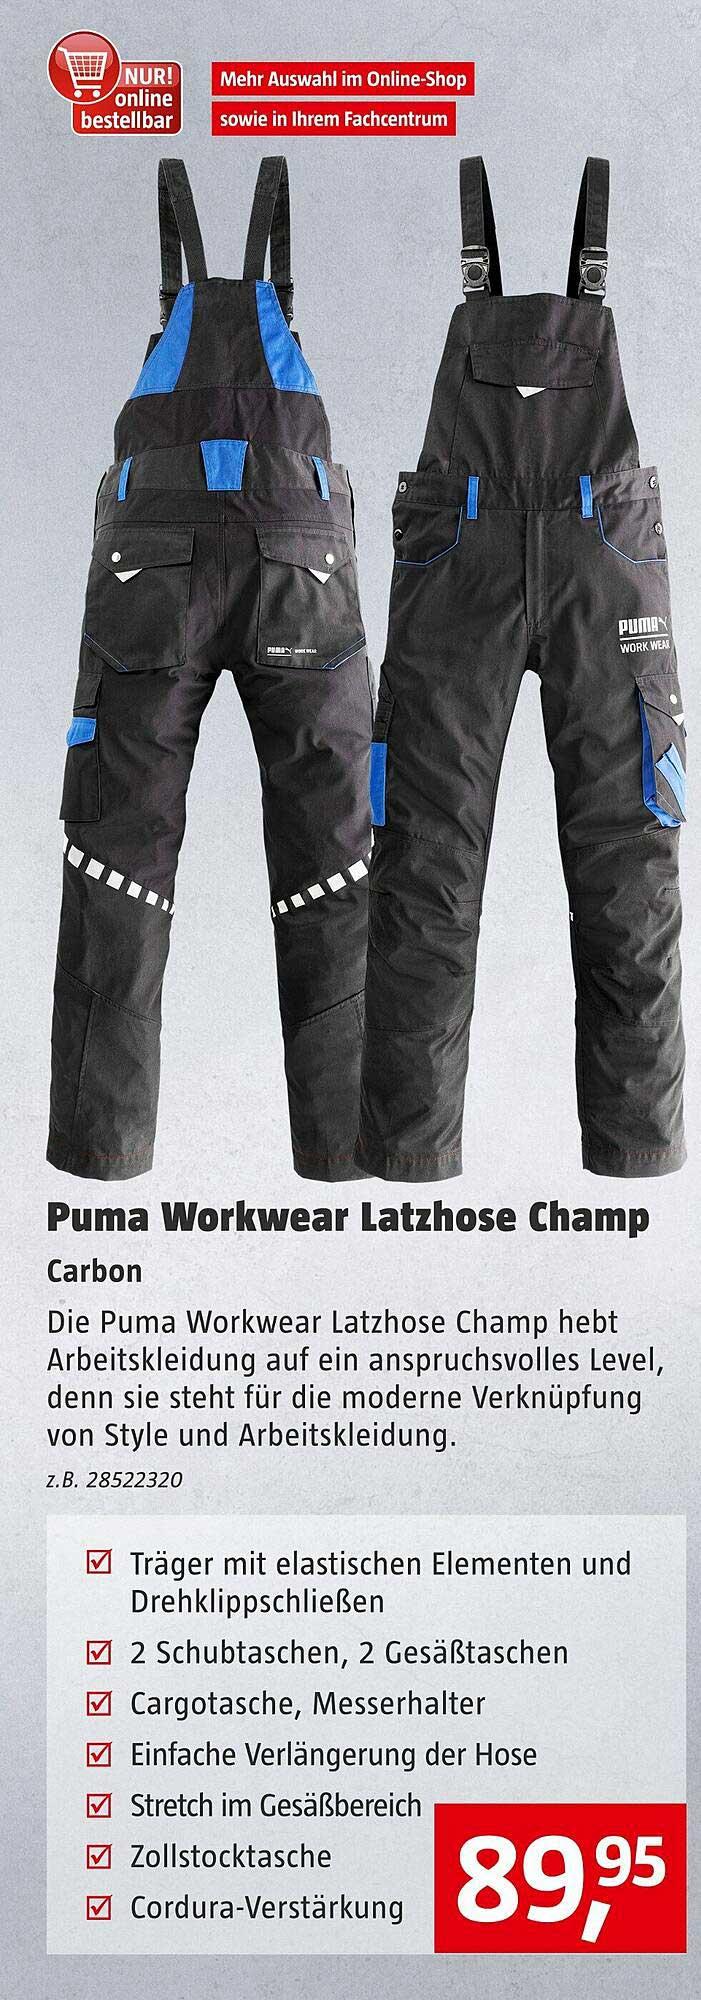 Bauhaus Puma Workwear Latzhose Champ